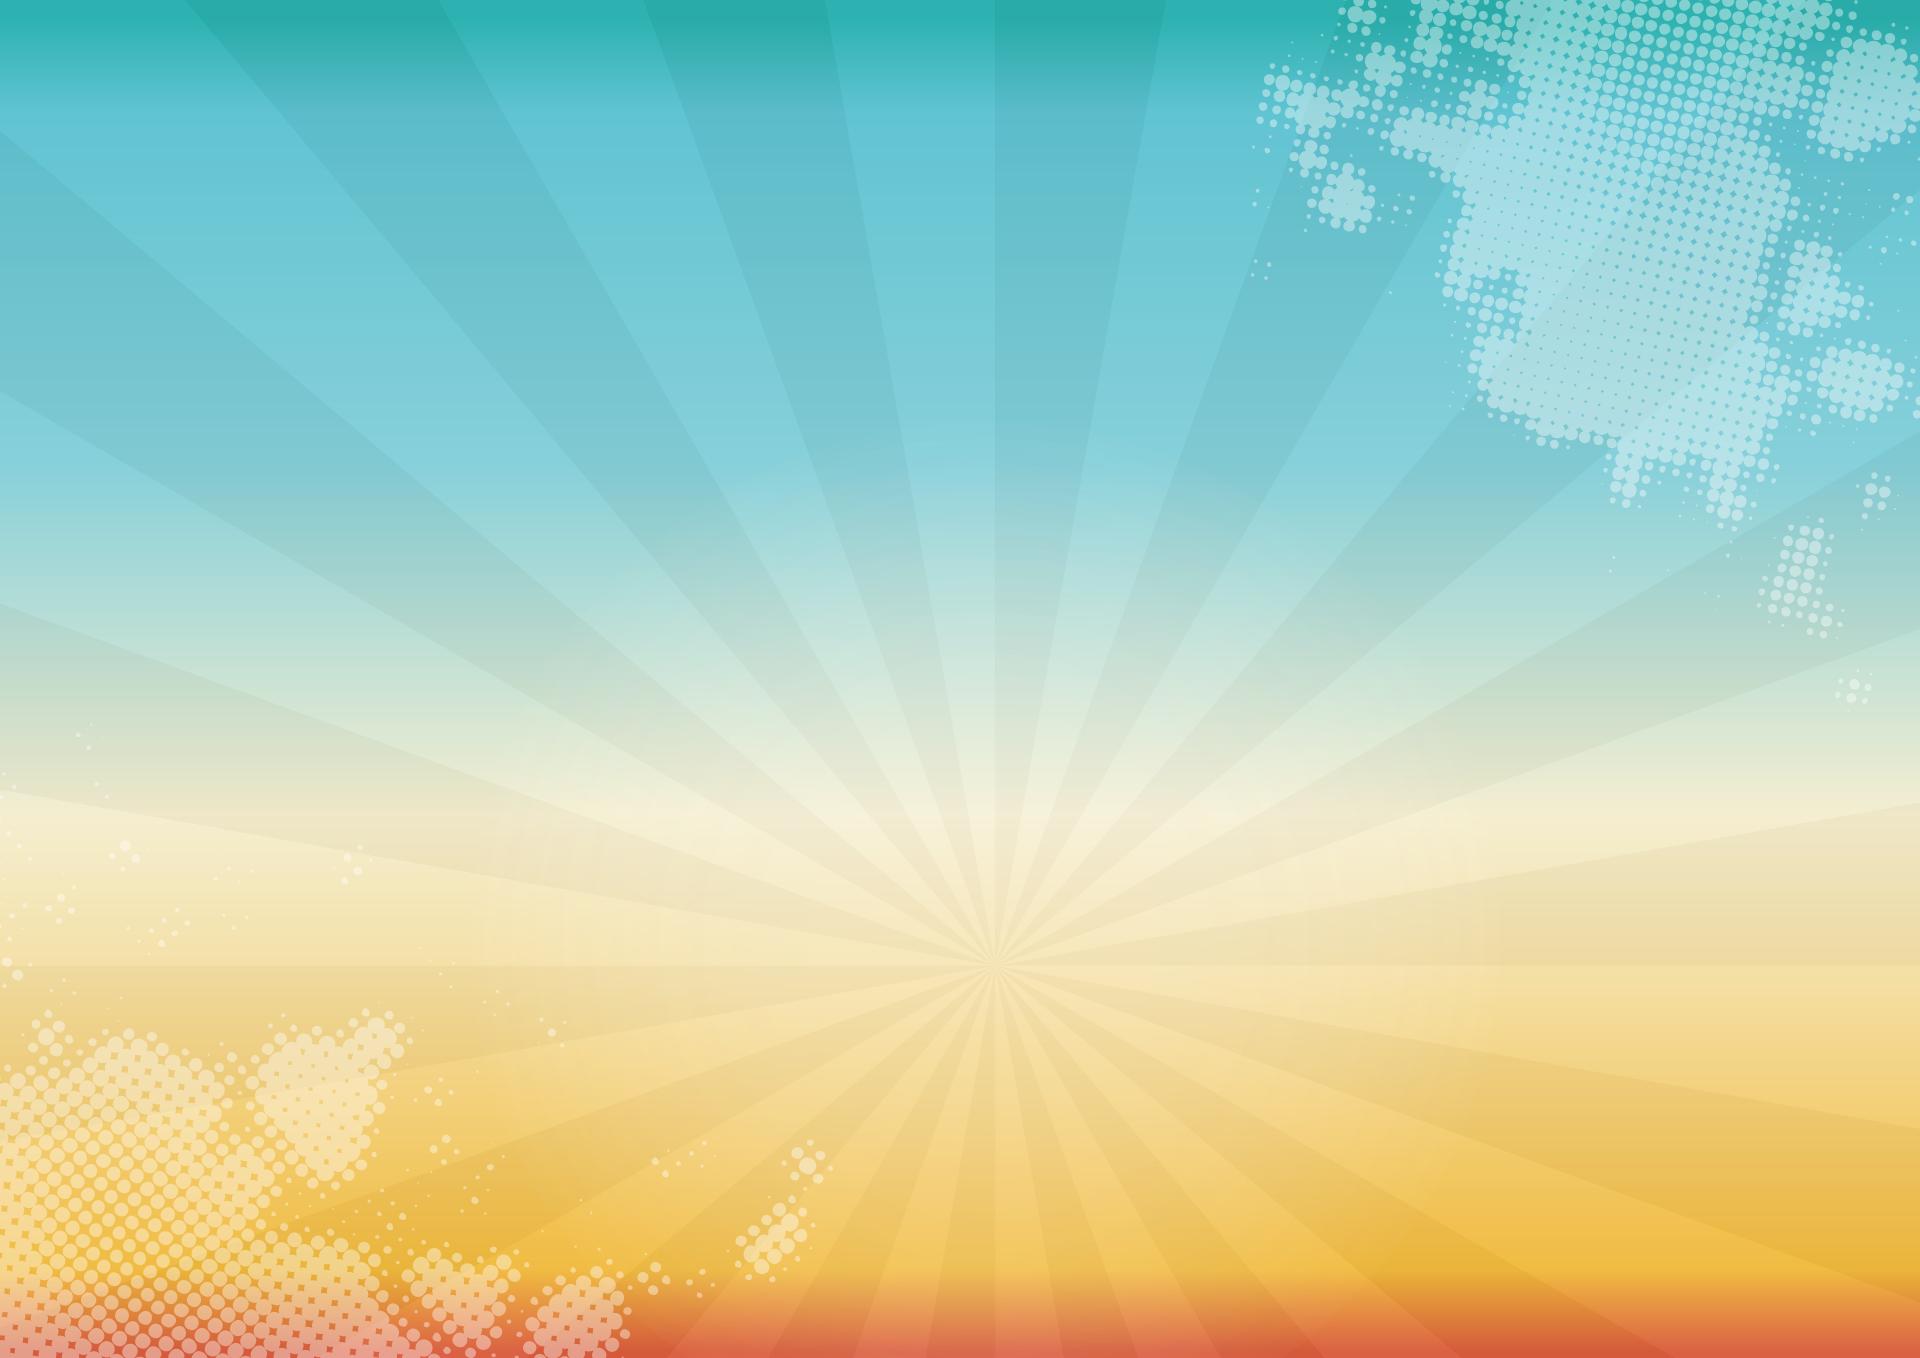 degradado, rayos, luces, nubes, colorido - Fondos de Pantalla HD - professor-falken.com